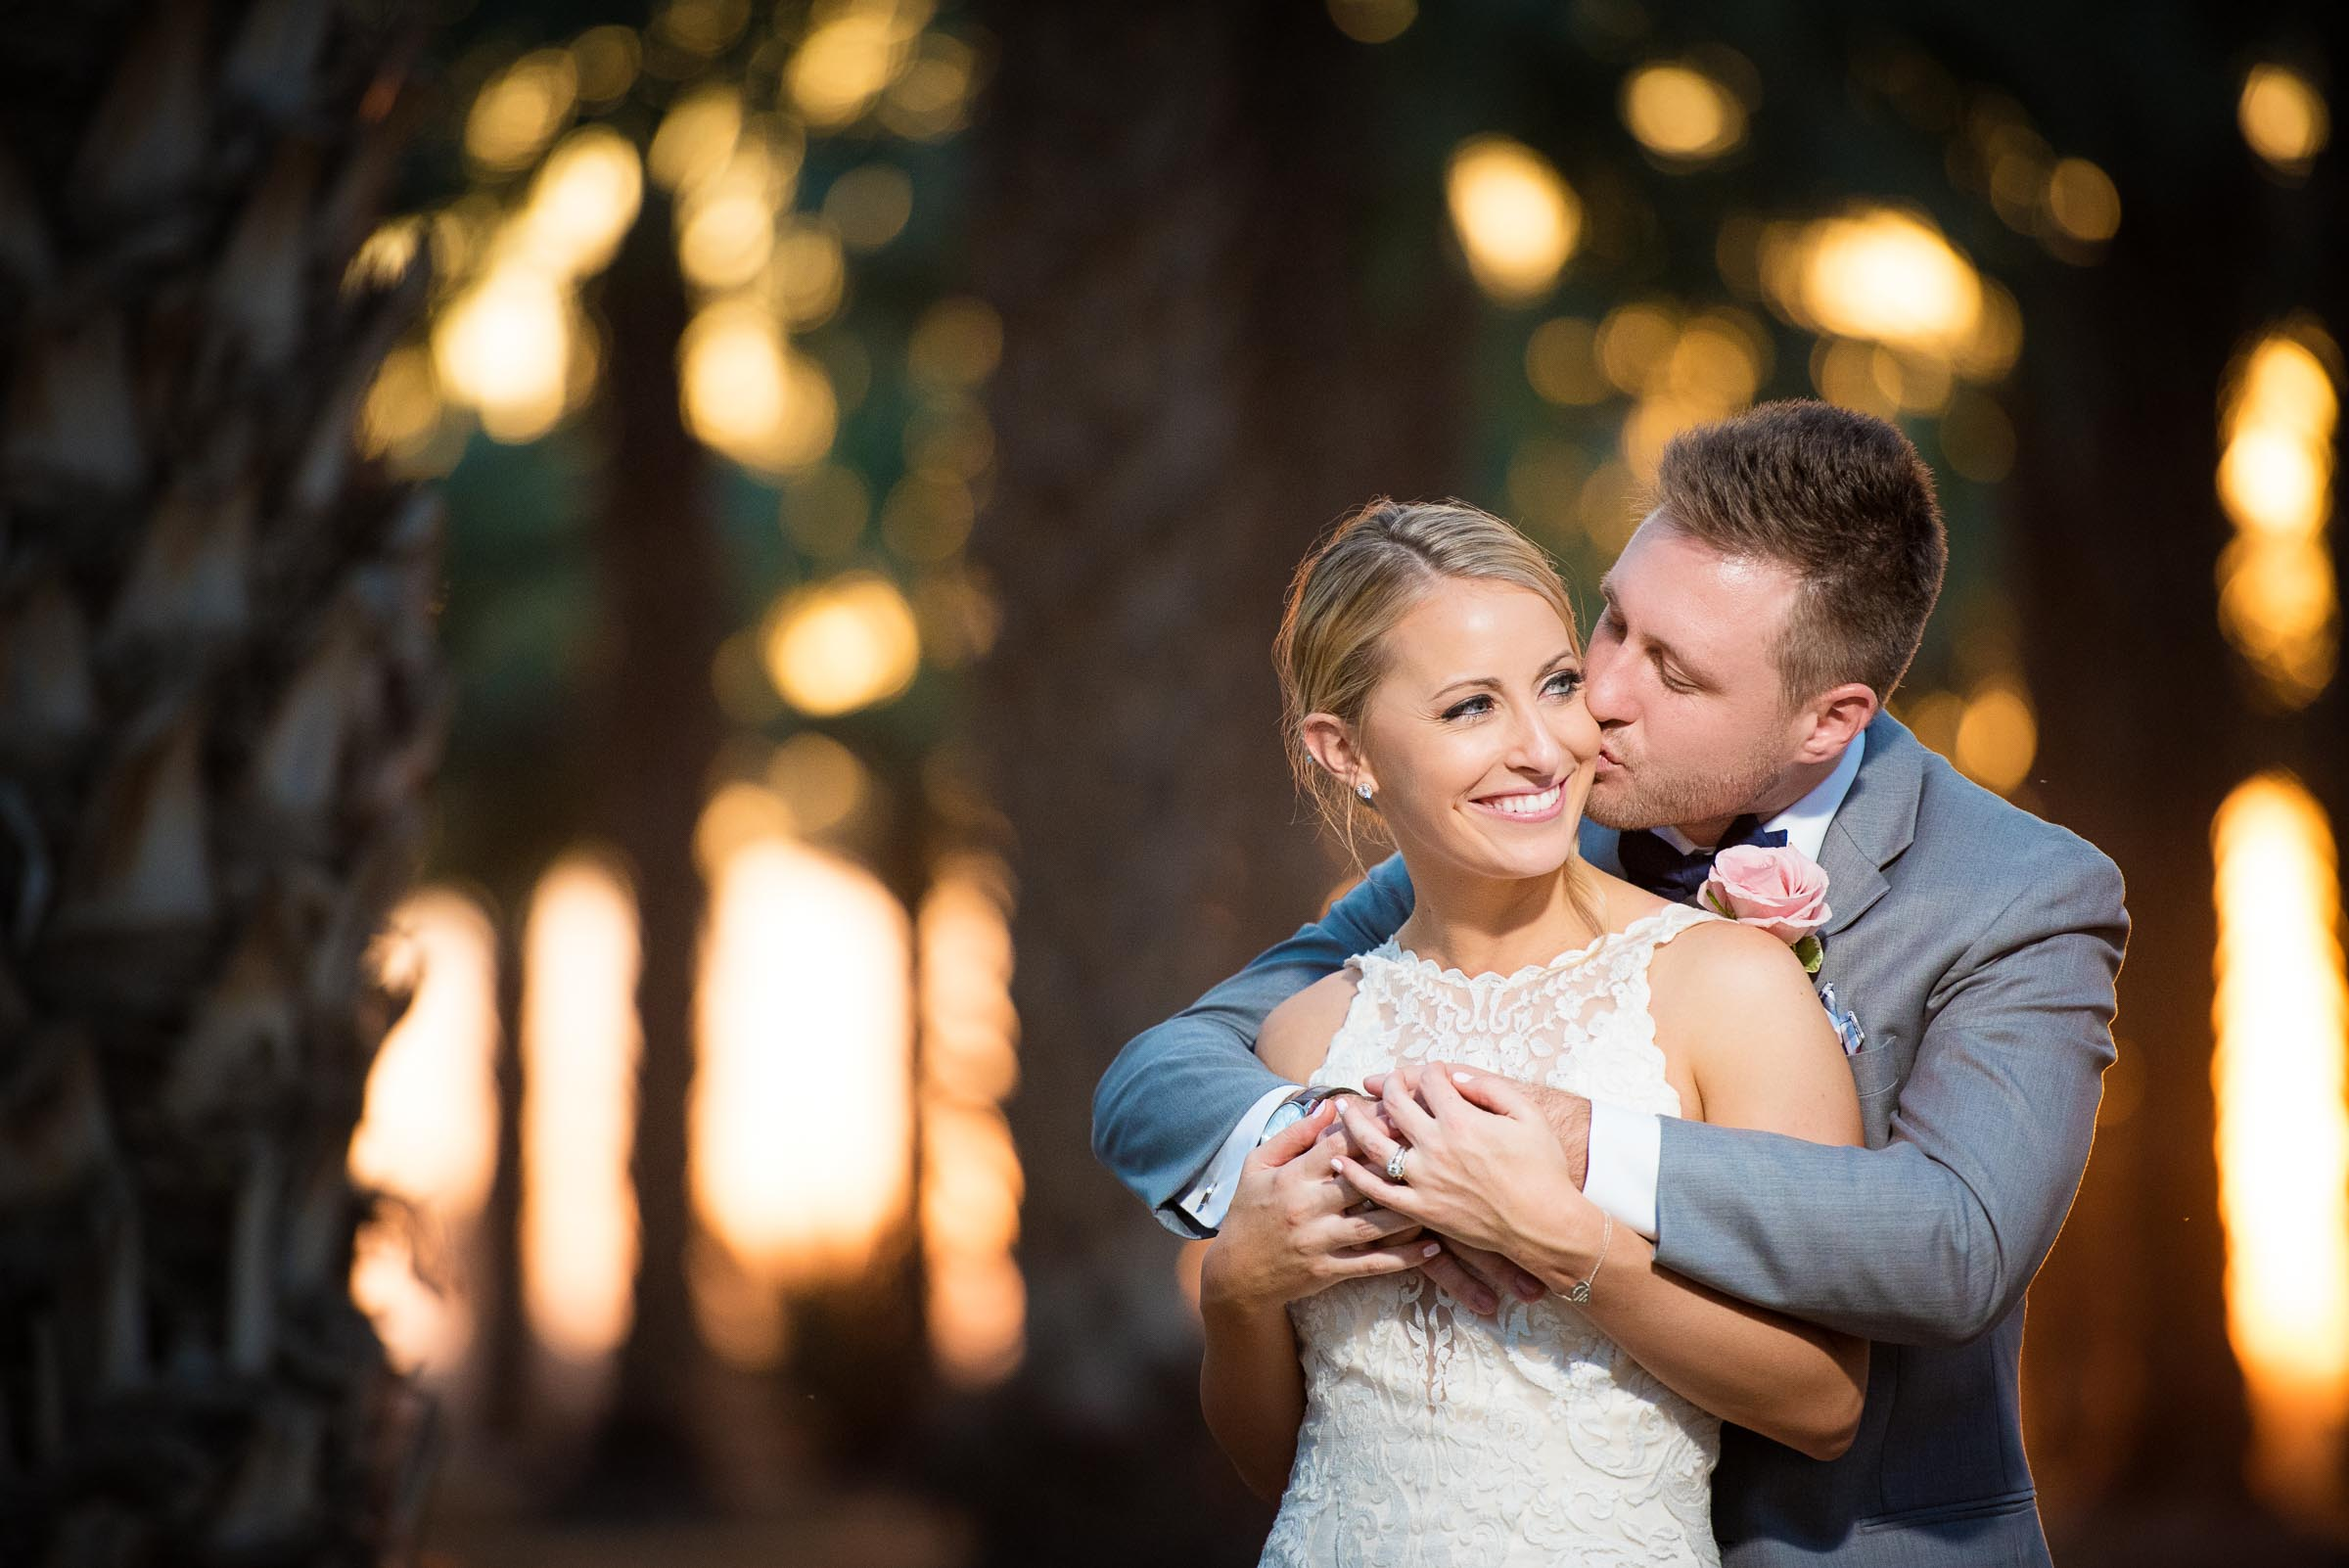 A beautiful private estate wedding photographed by Sarasota wedding photographers Fallbrook Photography